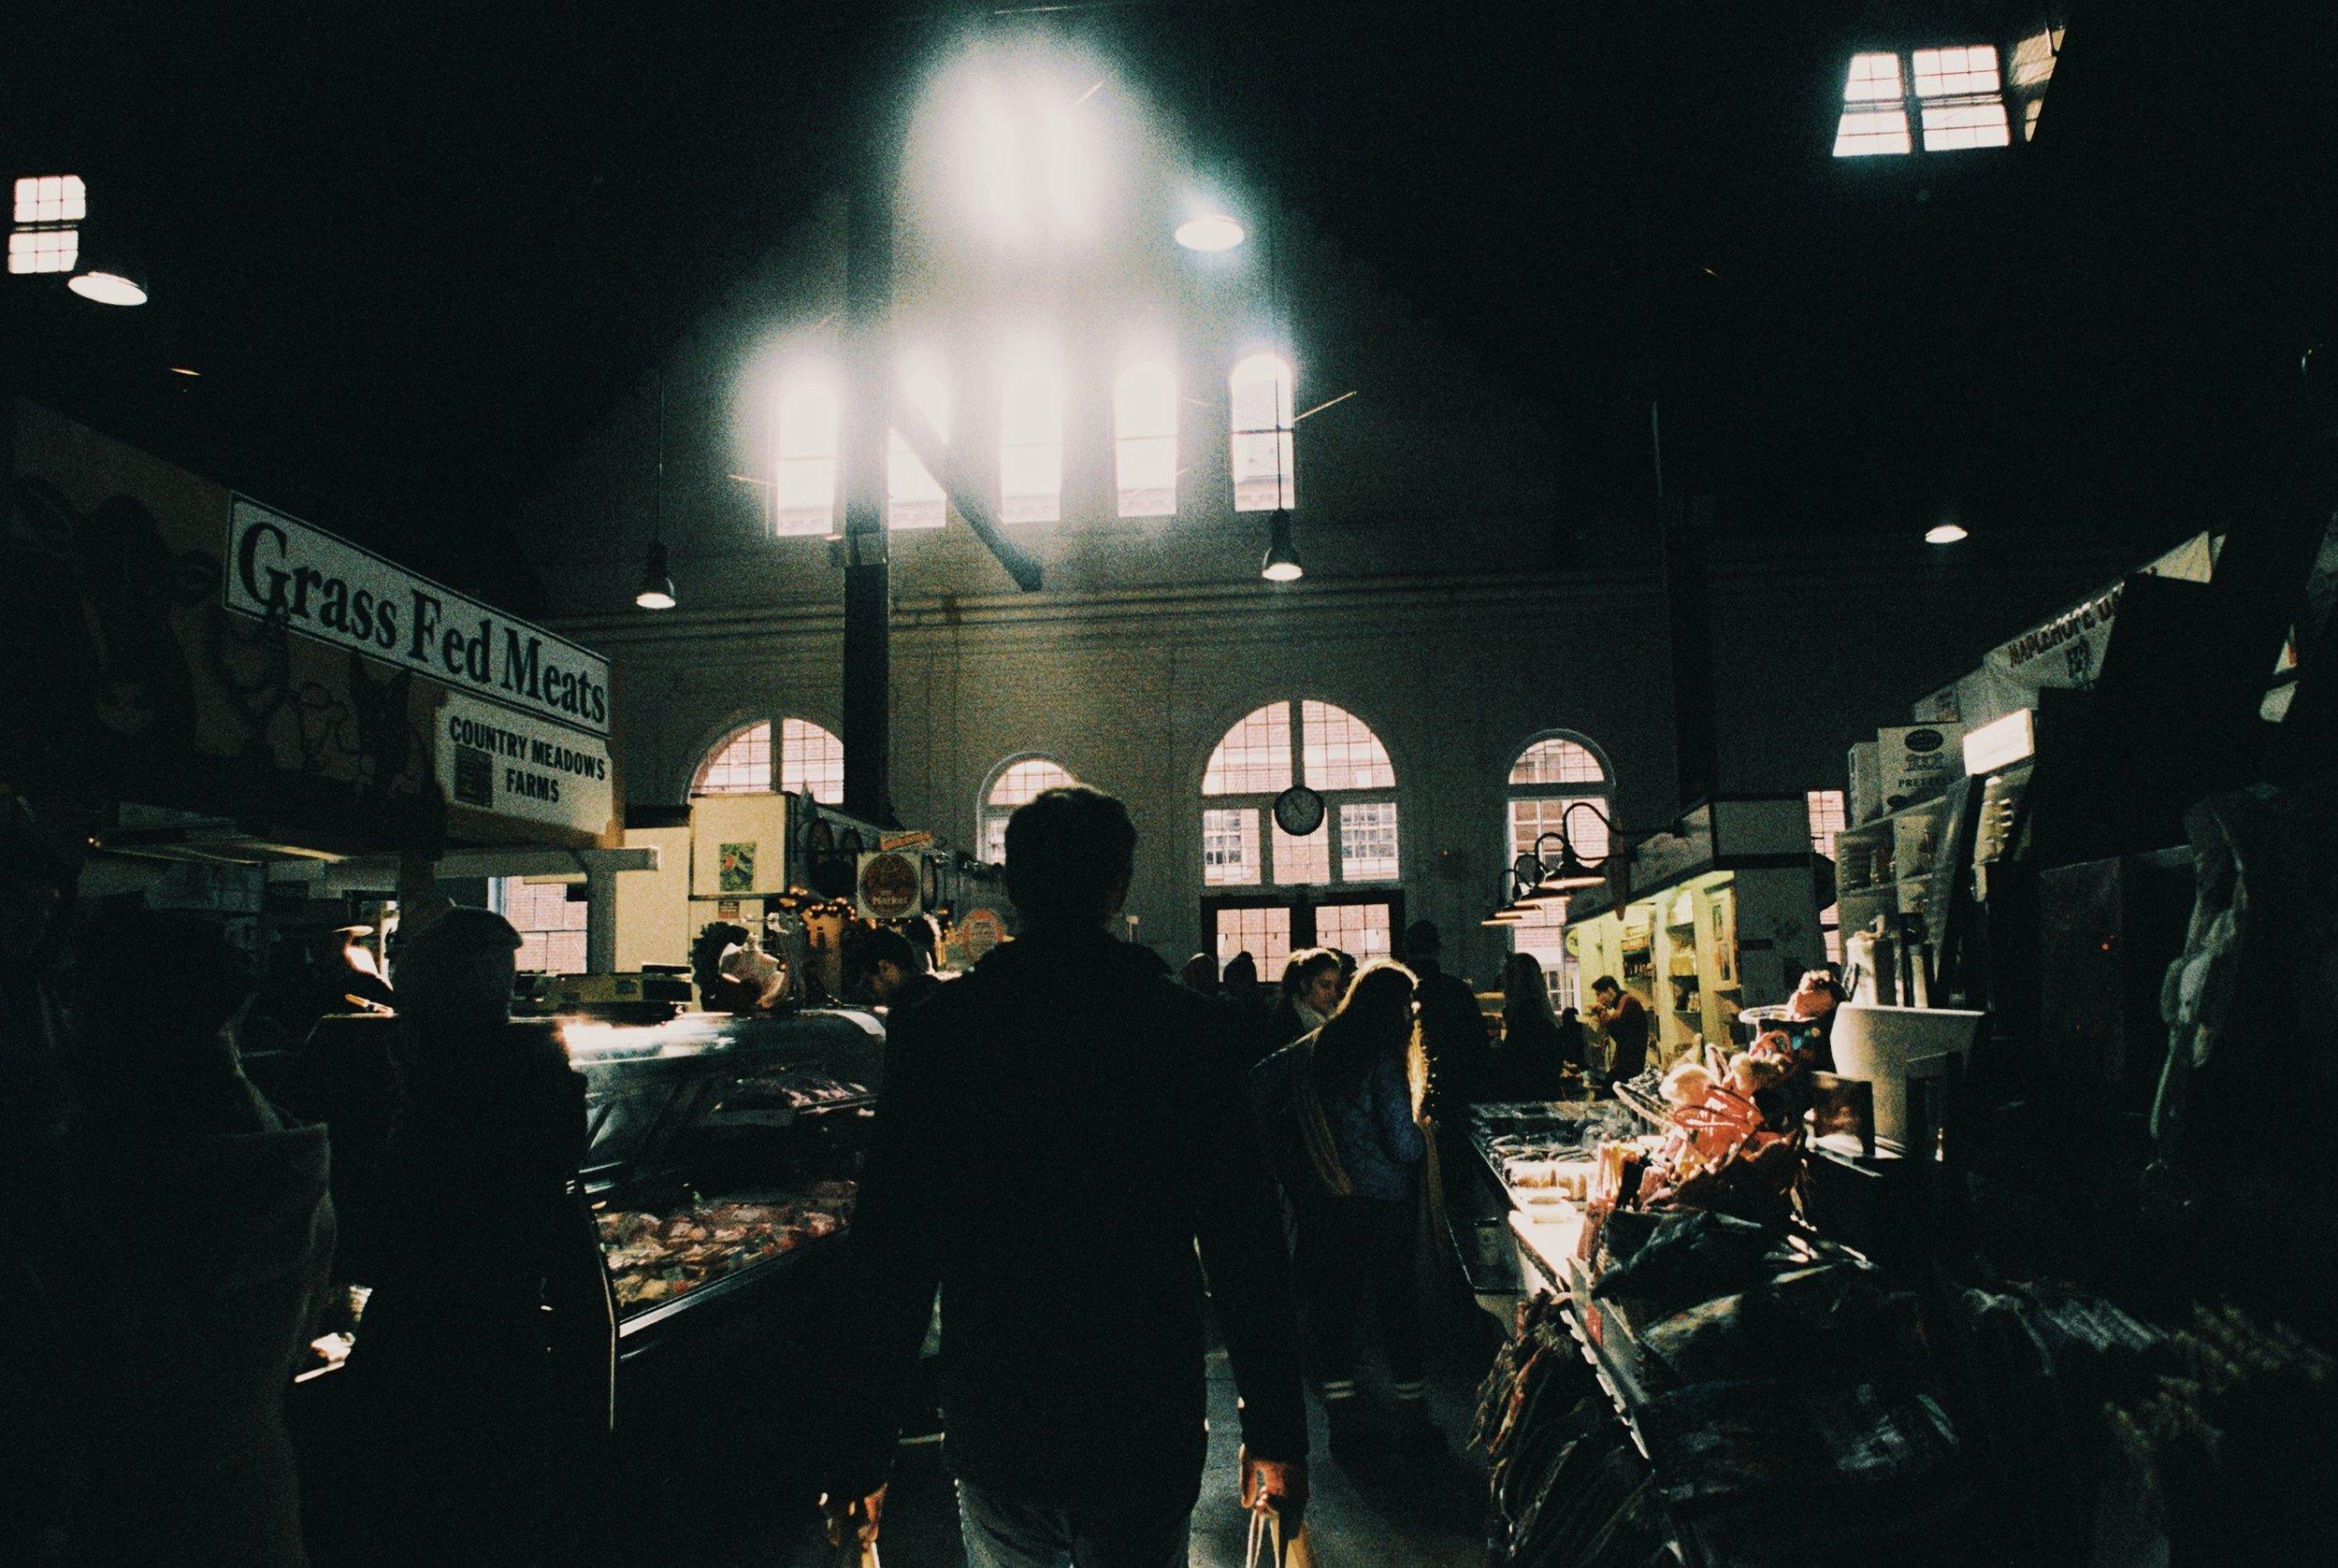 Central-Market-Luis-lopez-photography.jpg